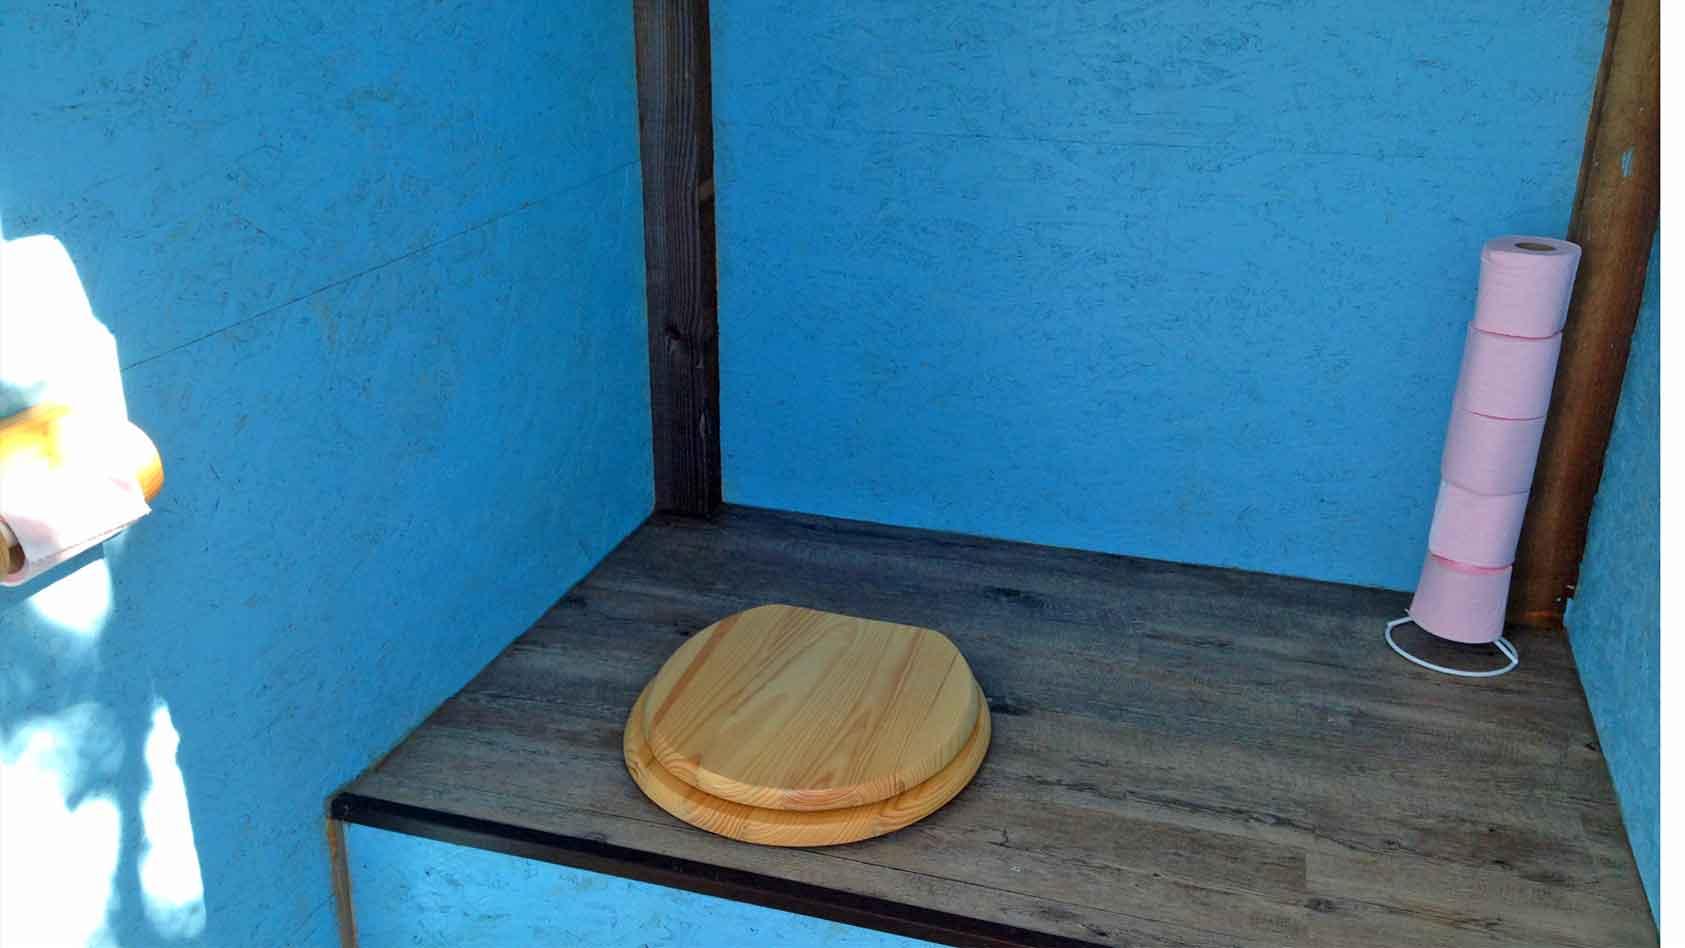 eco-compost-toilet-wc-blue-caravan-mobil-home-WeB